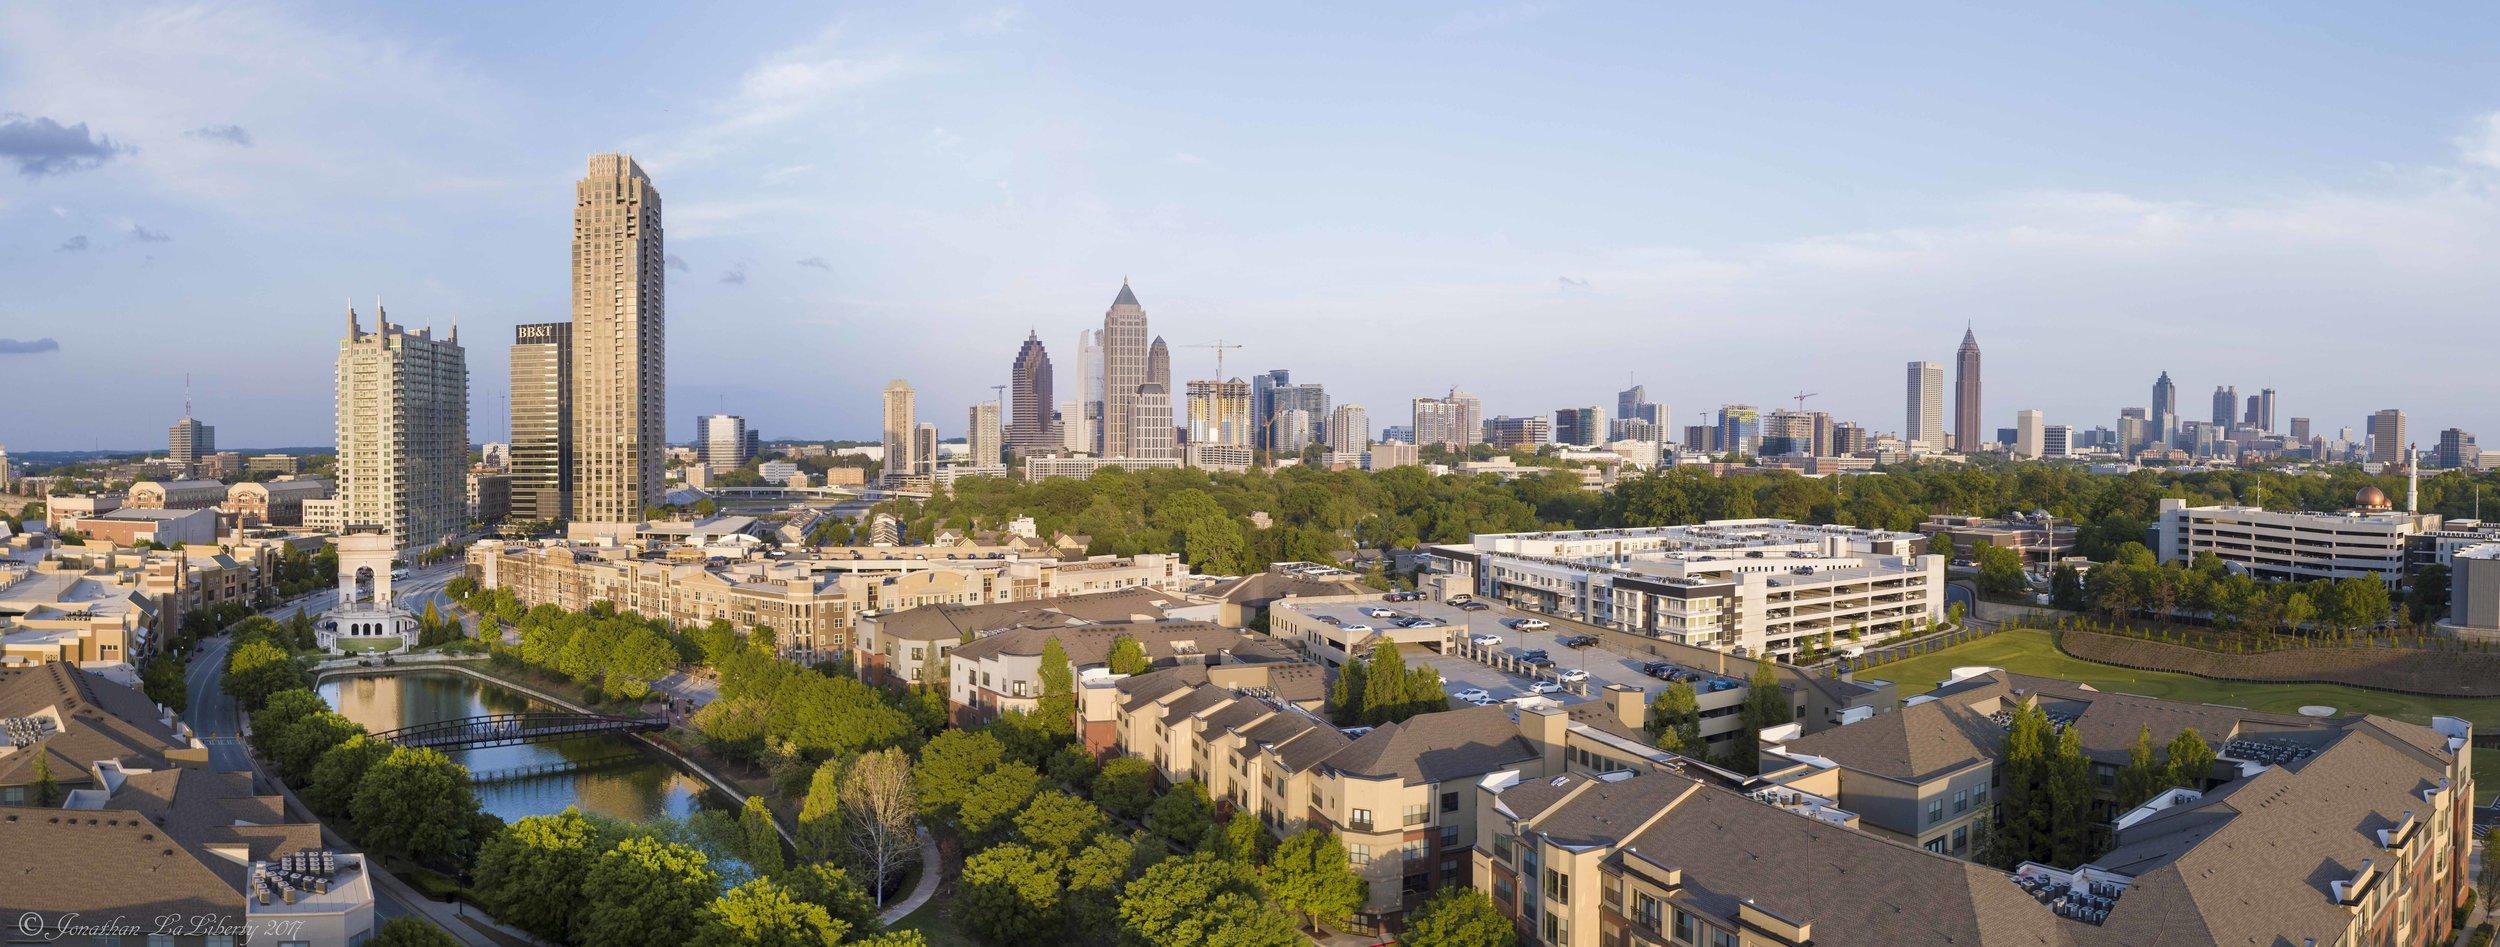 Atlantic Station Atlanta Drone Photography Panorama